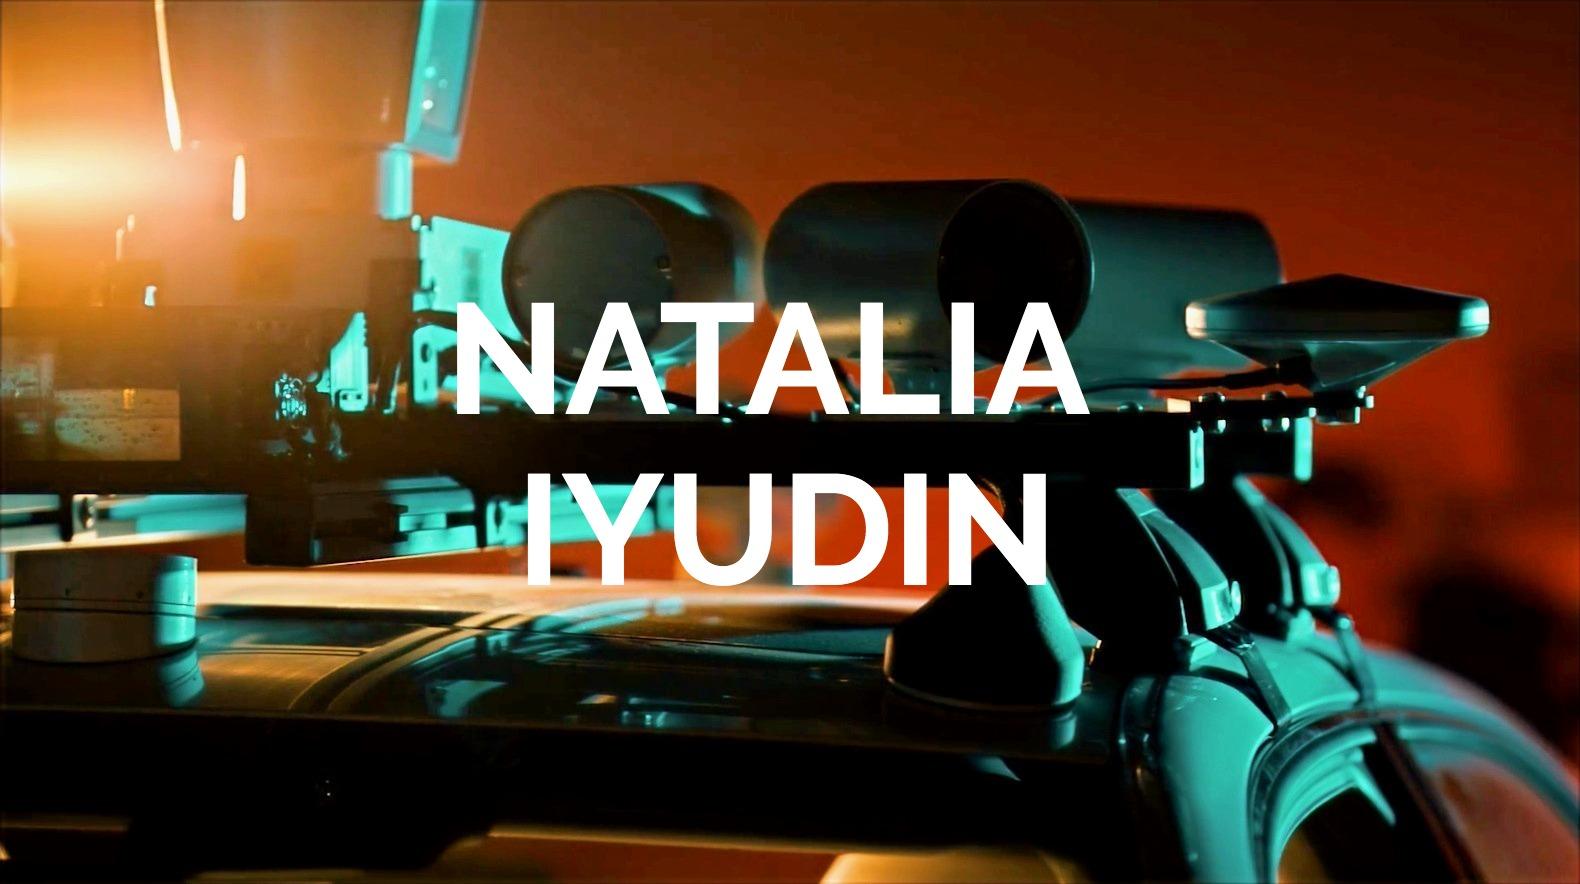 Natalia Iyudin